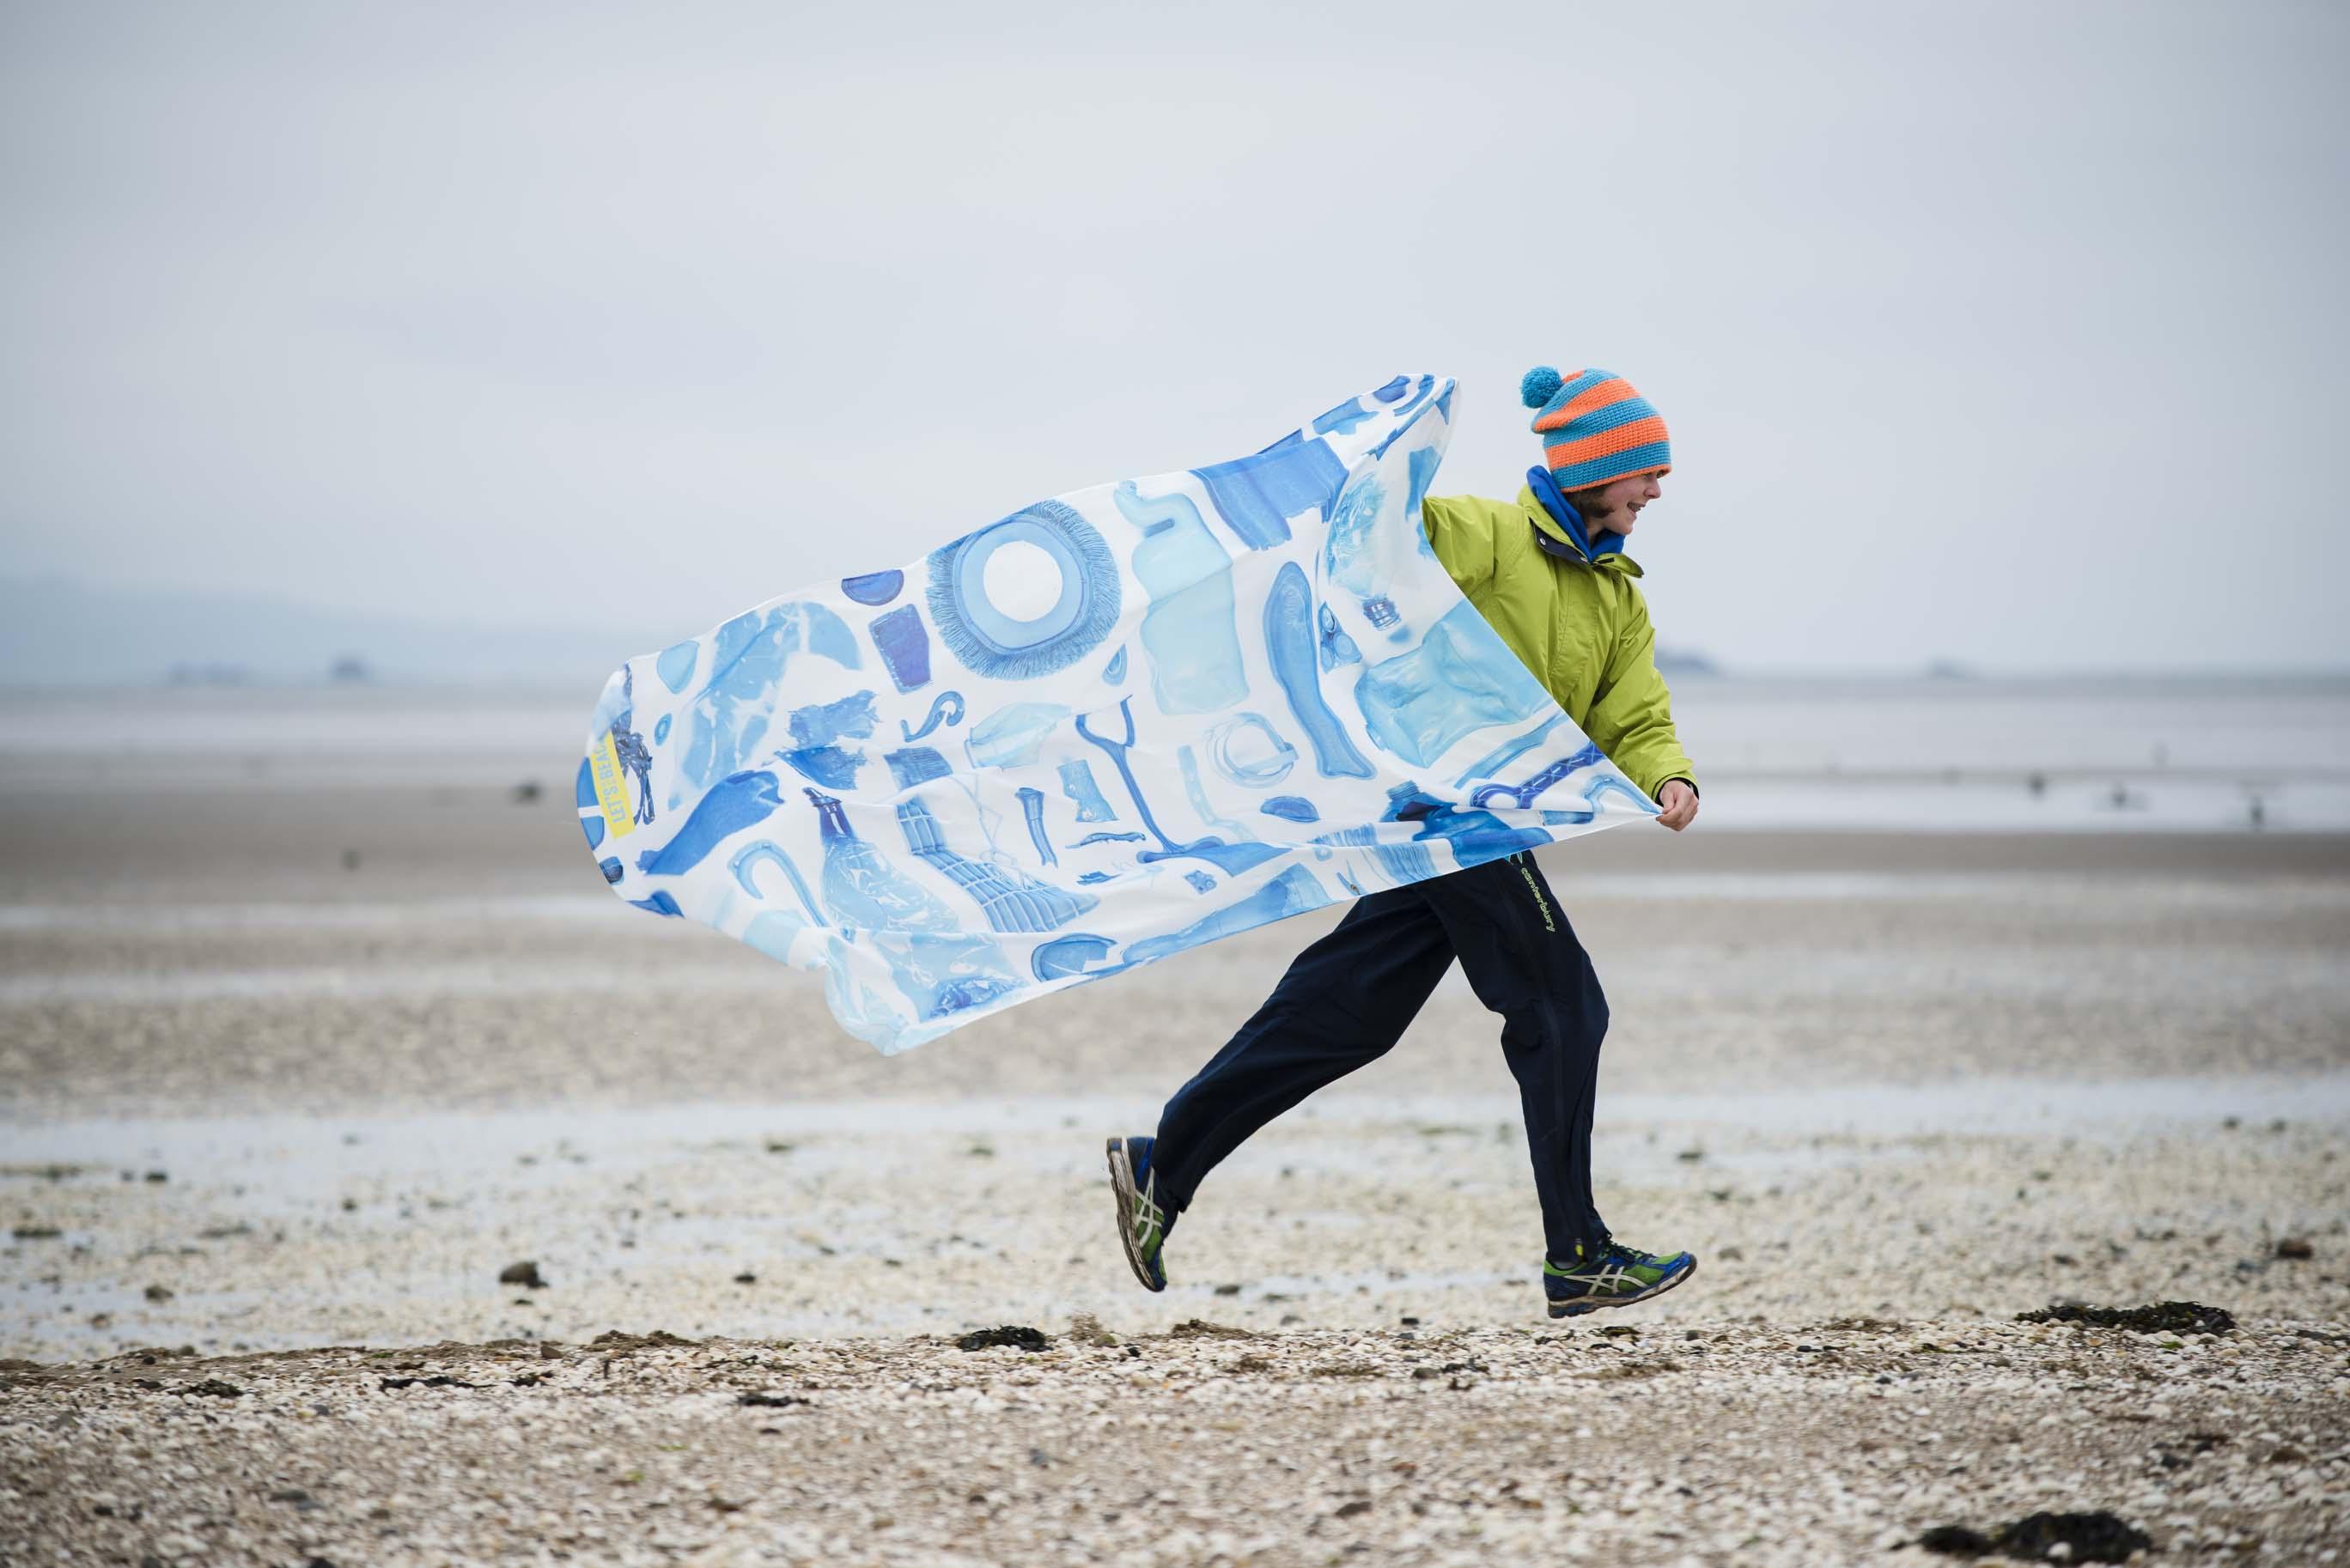 photo shoot 2: running for rio?